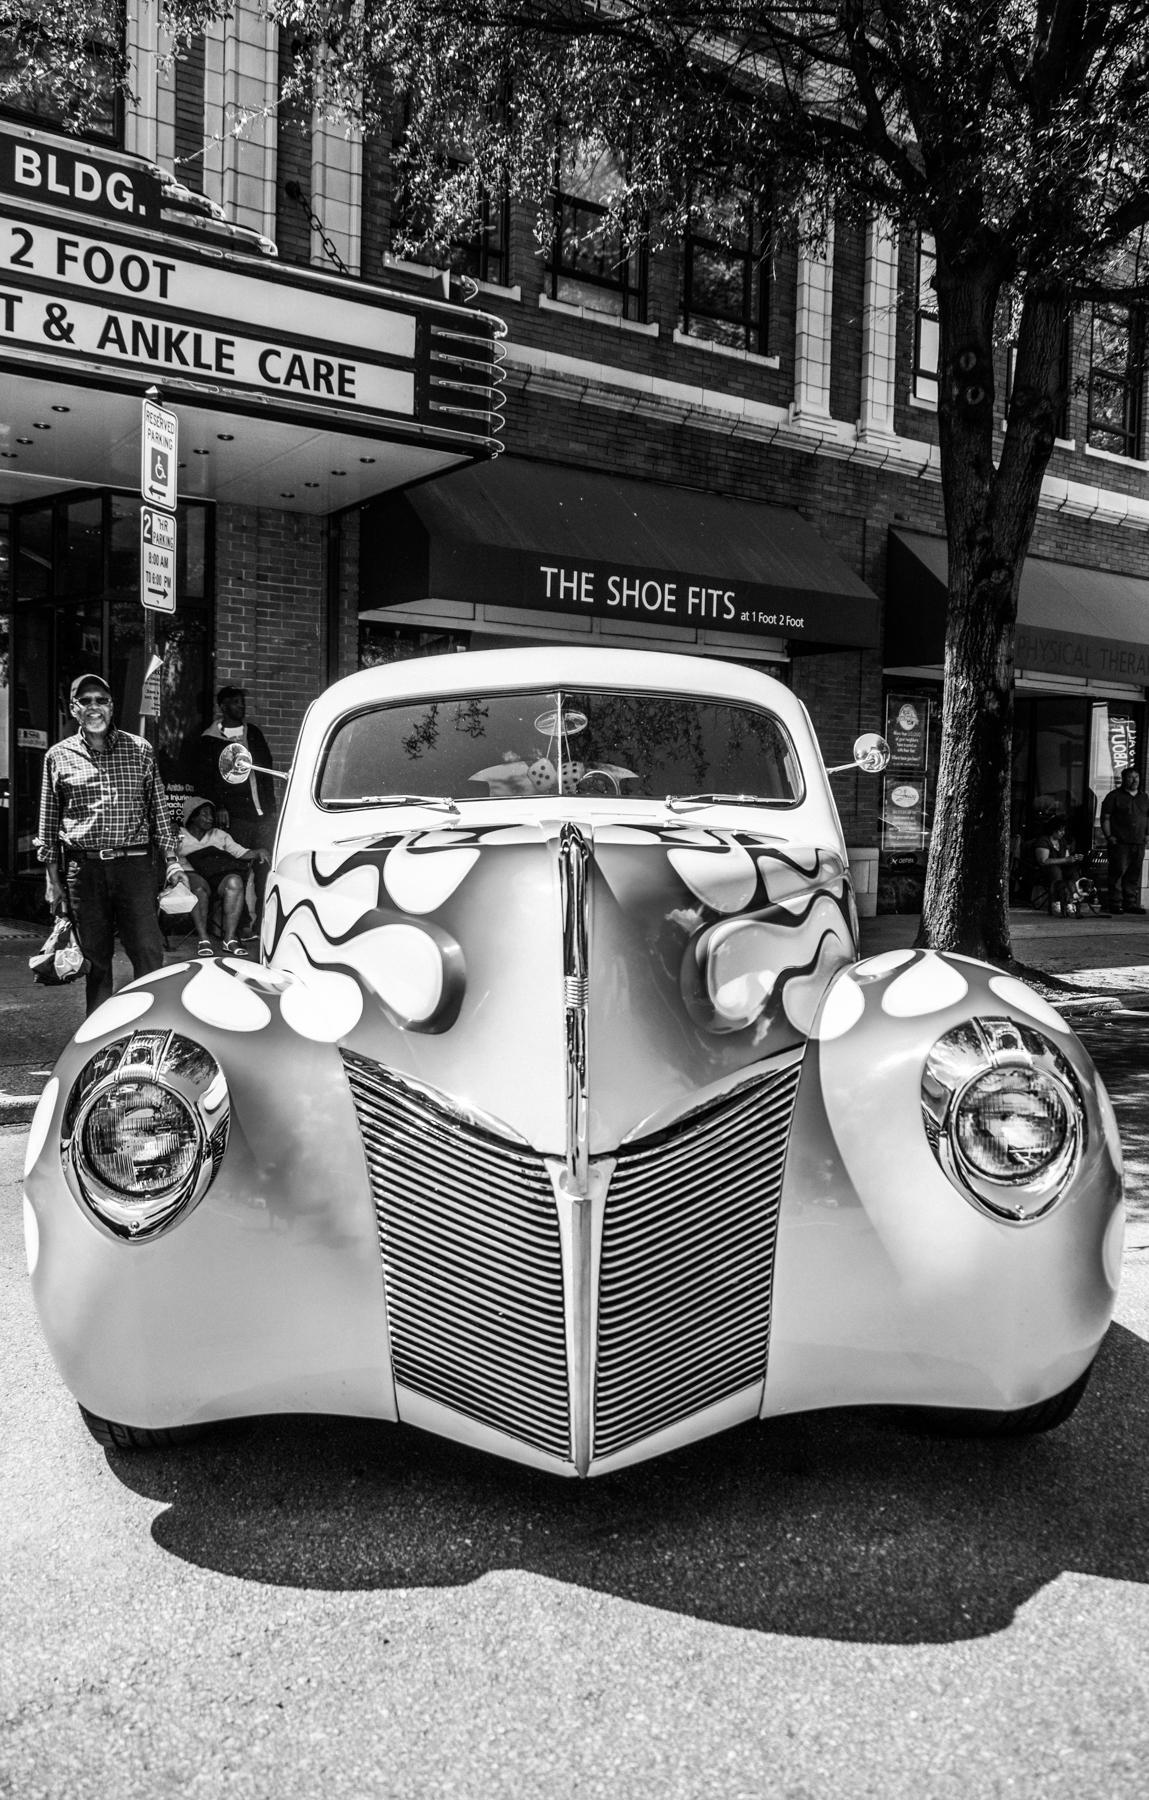 fine-art-photography-suffolk-virginia-car